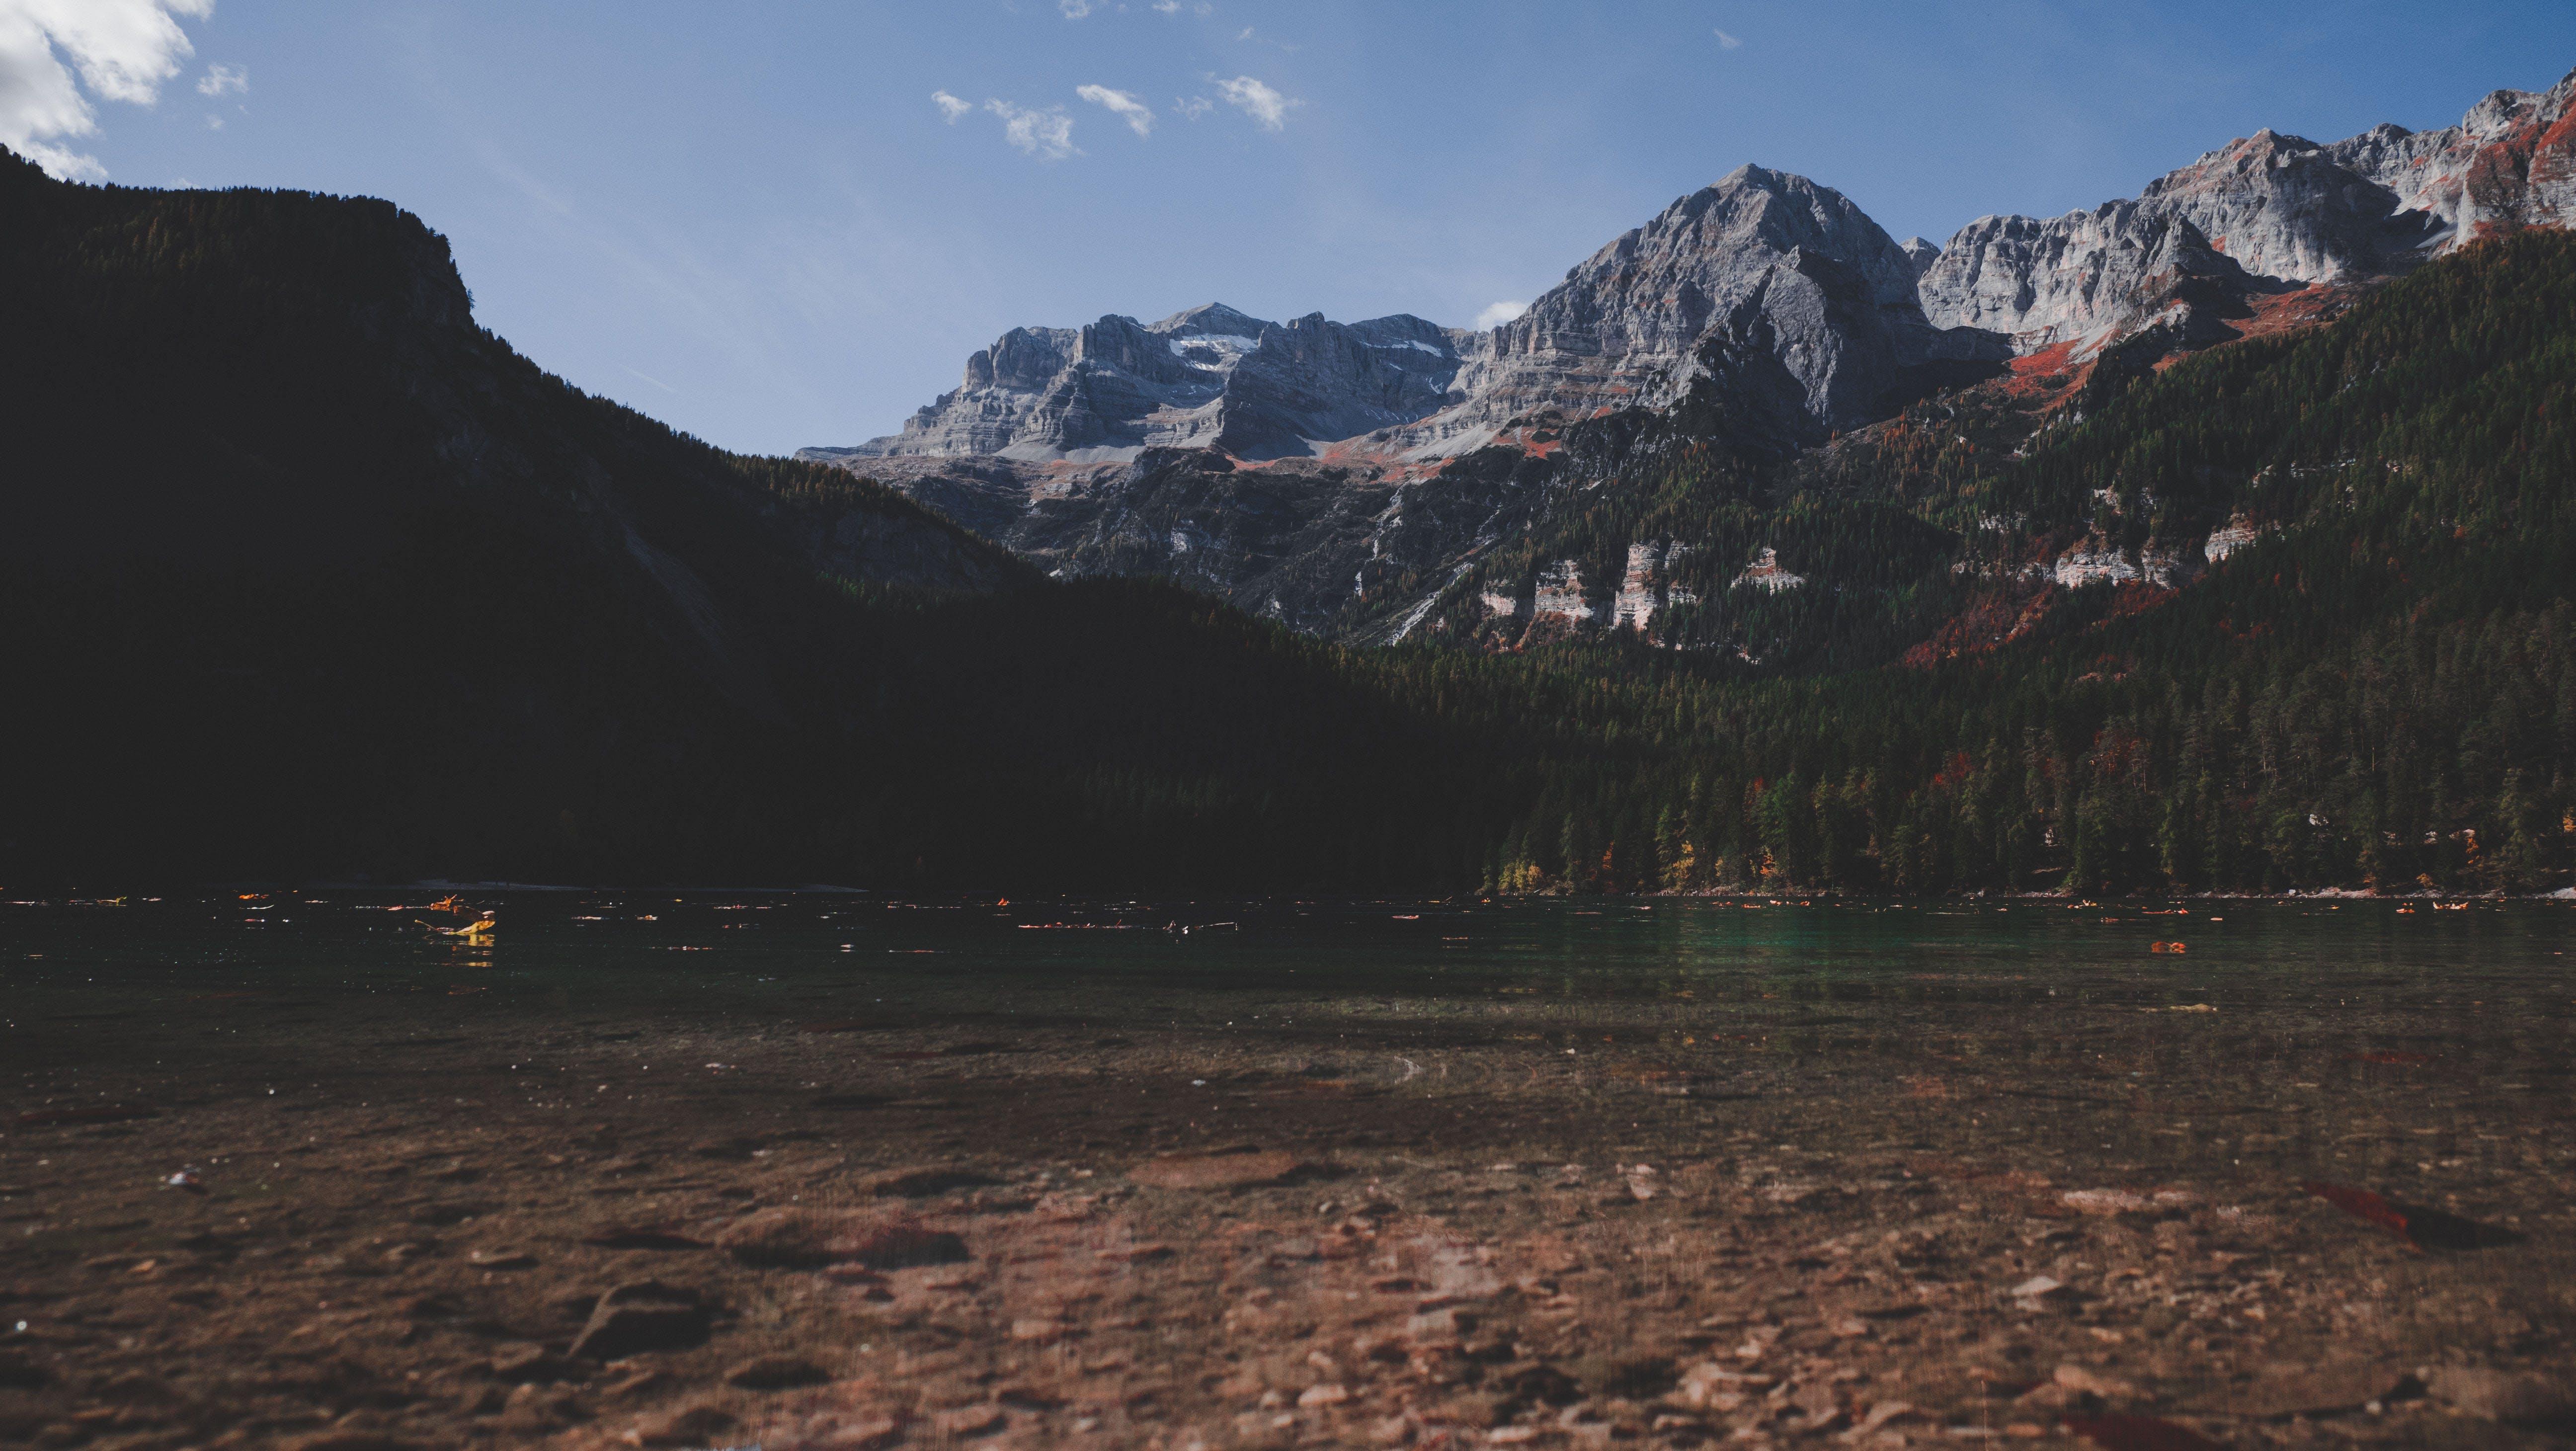 denné svetlo, hora, krajina